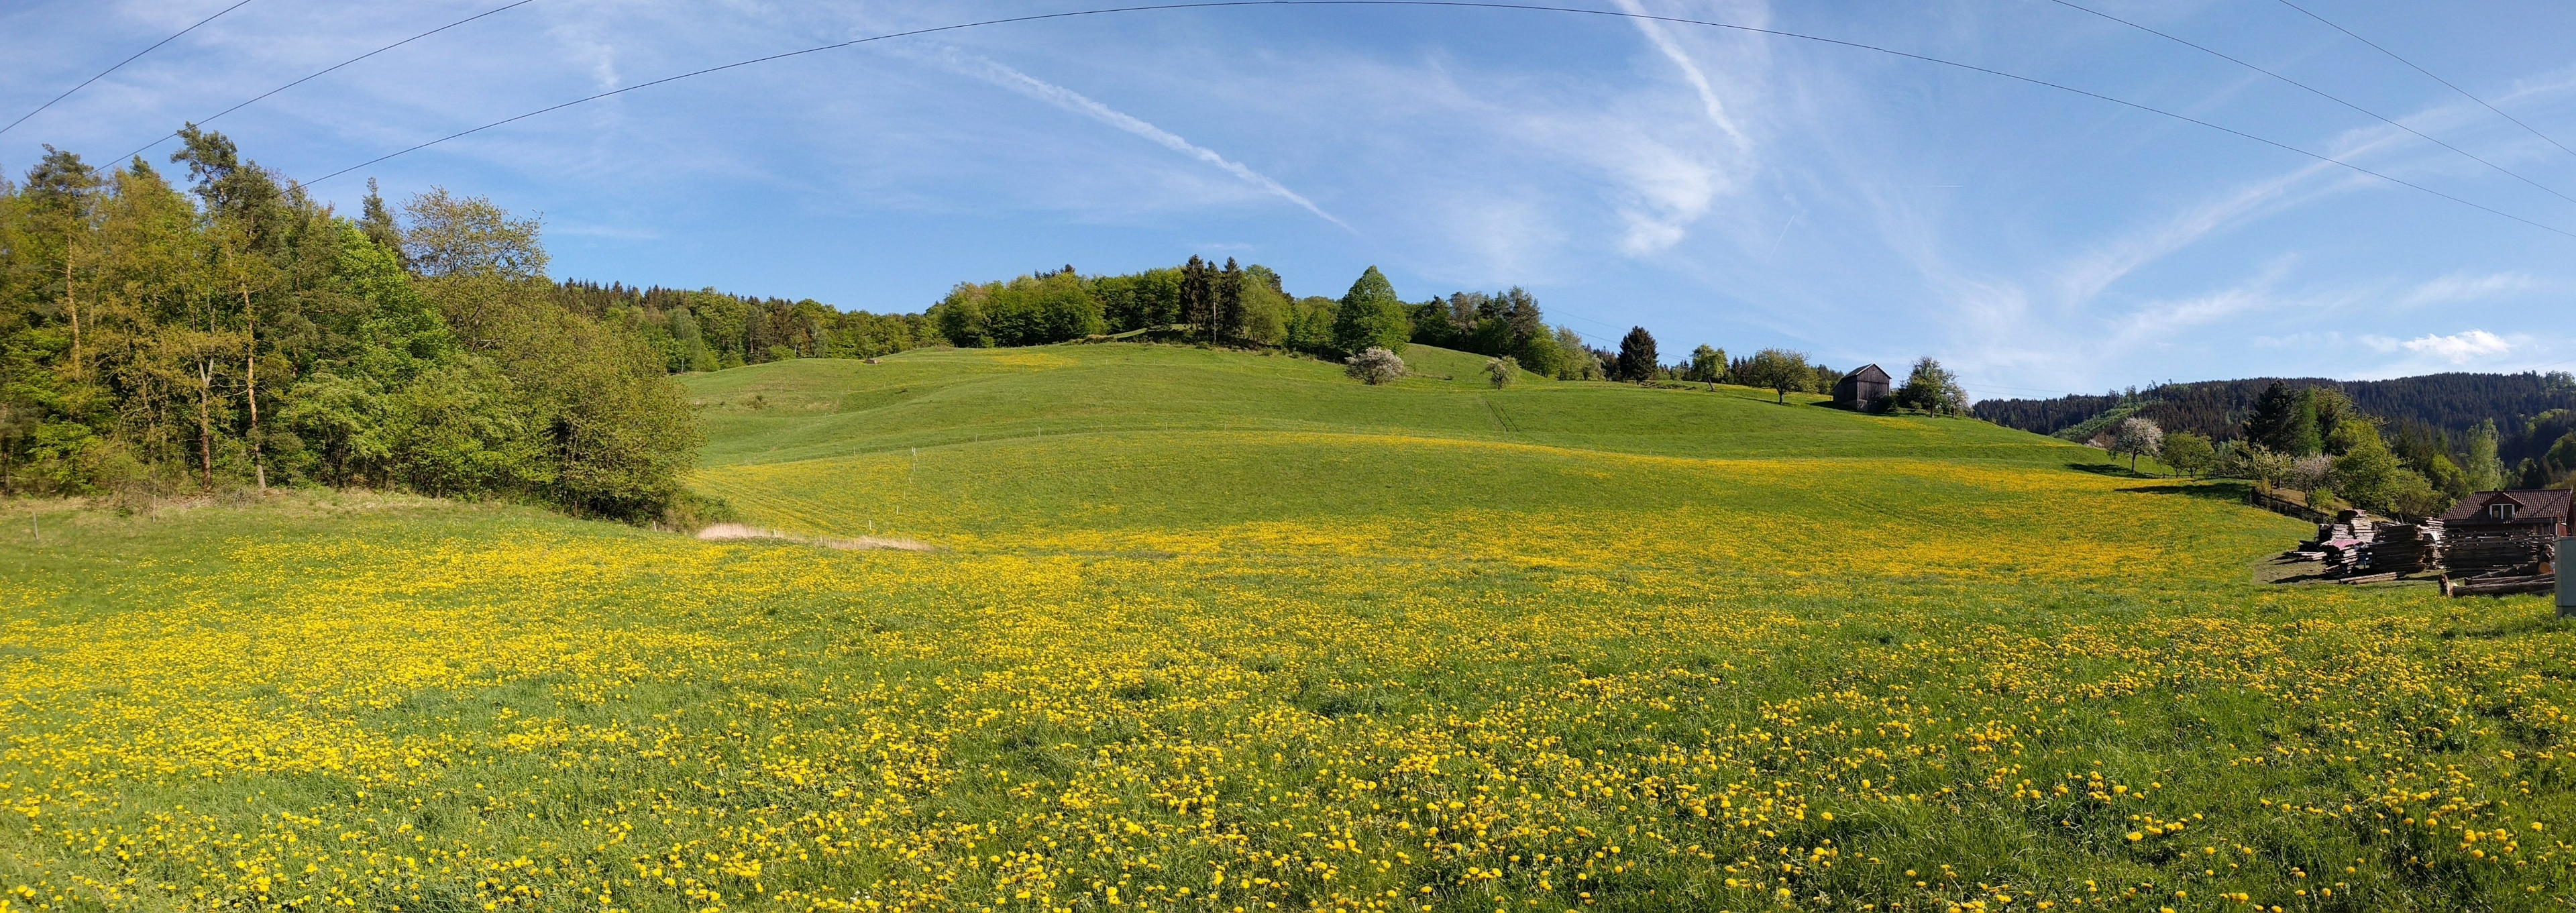 Saalfeld-Rudolstadt District, Thuringia, Germany